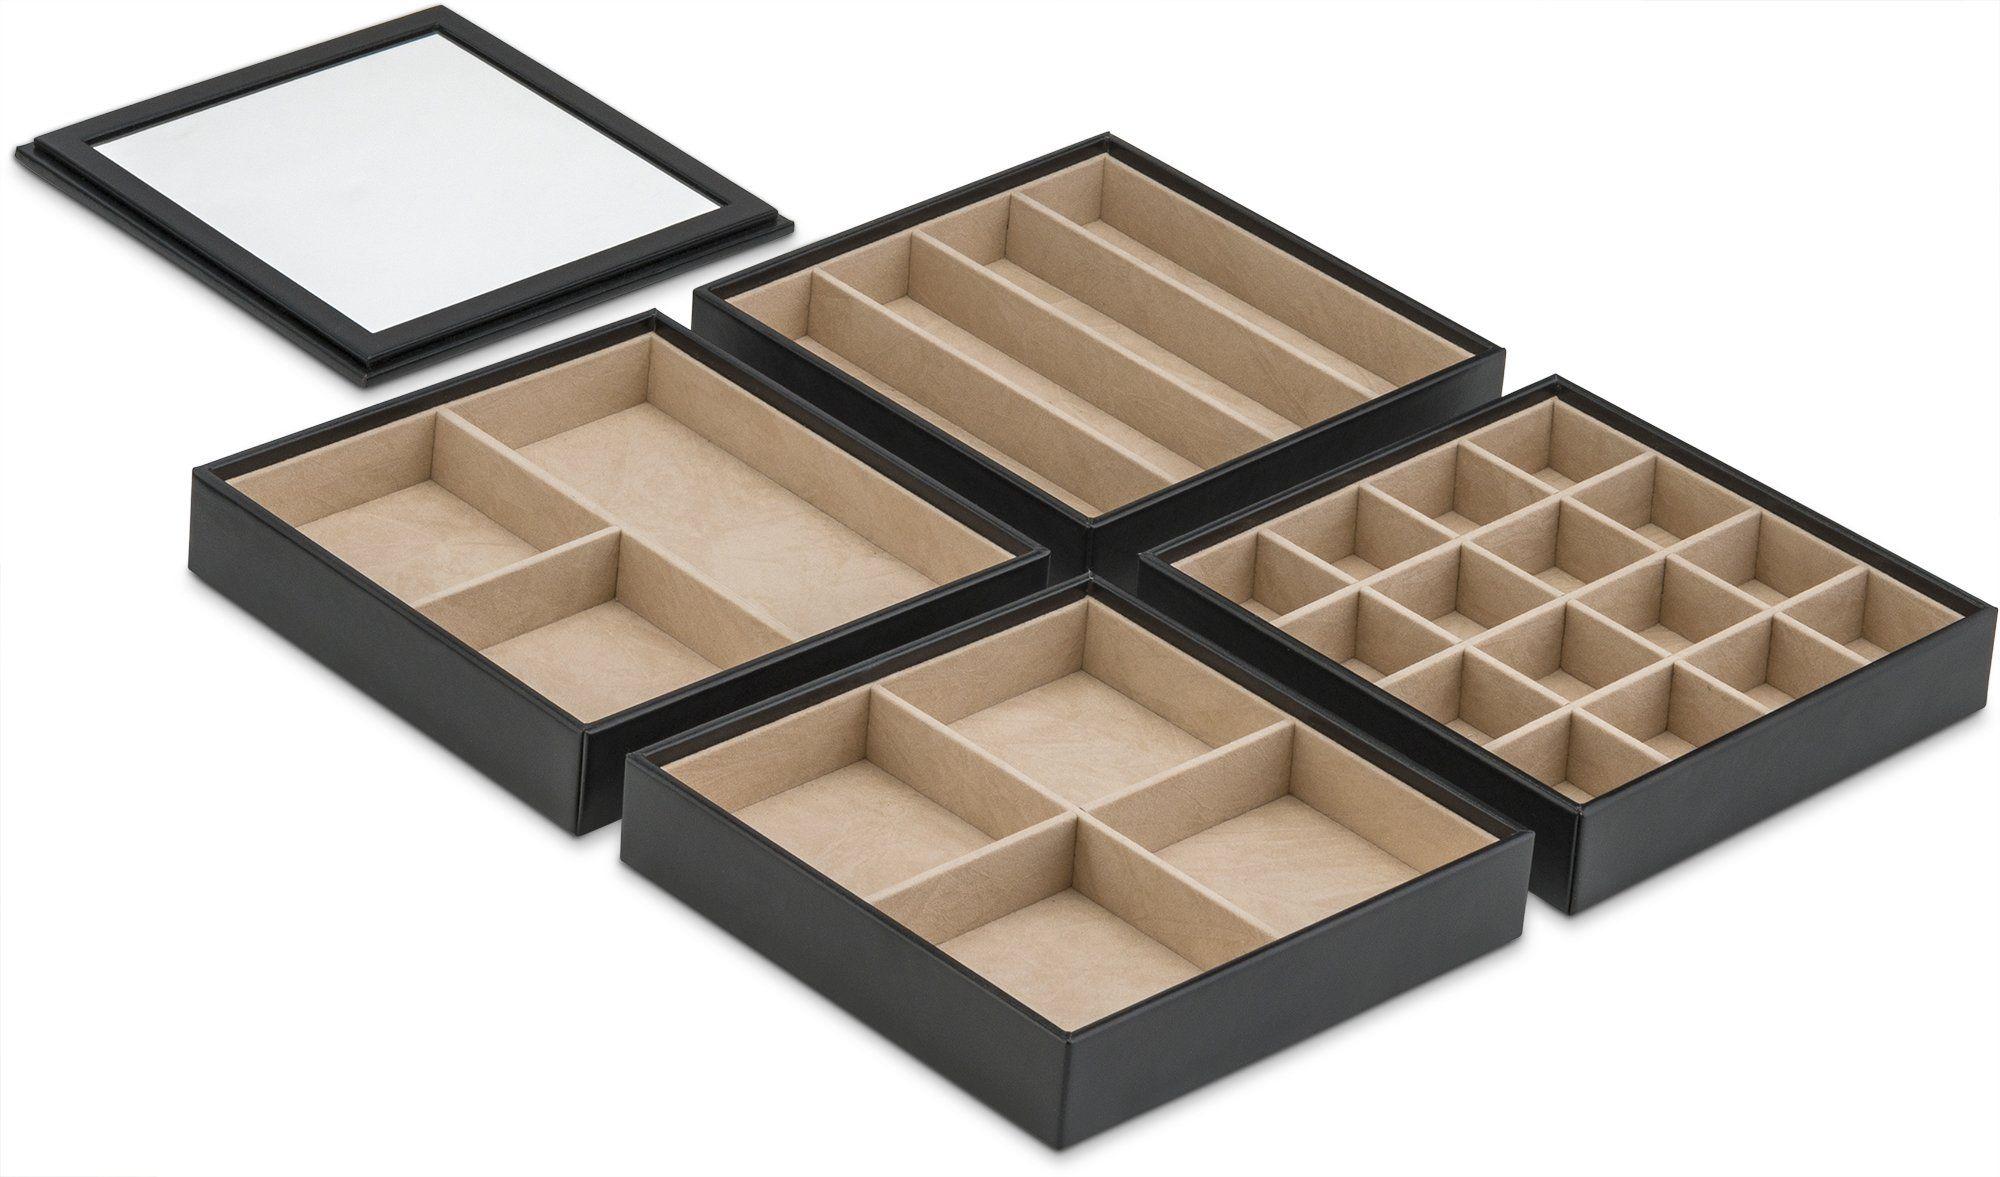 organizer drawer tray view dp com drawers jewelry compartments larger burgundy amazon stax neatnix